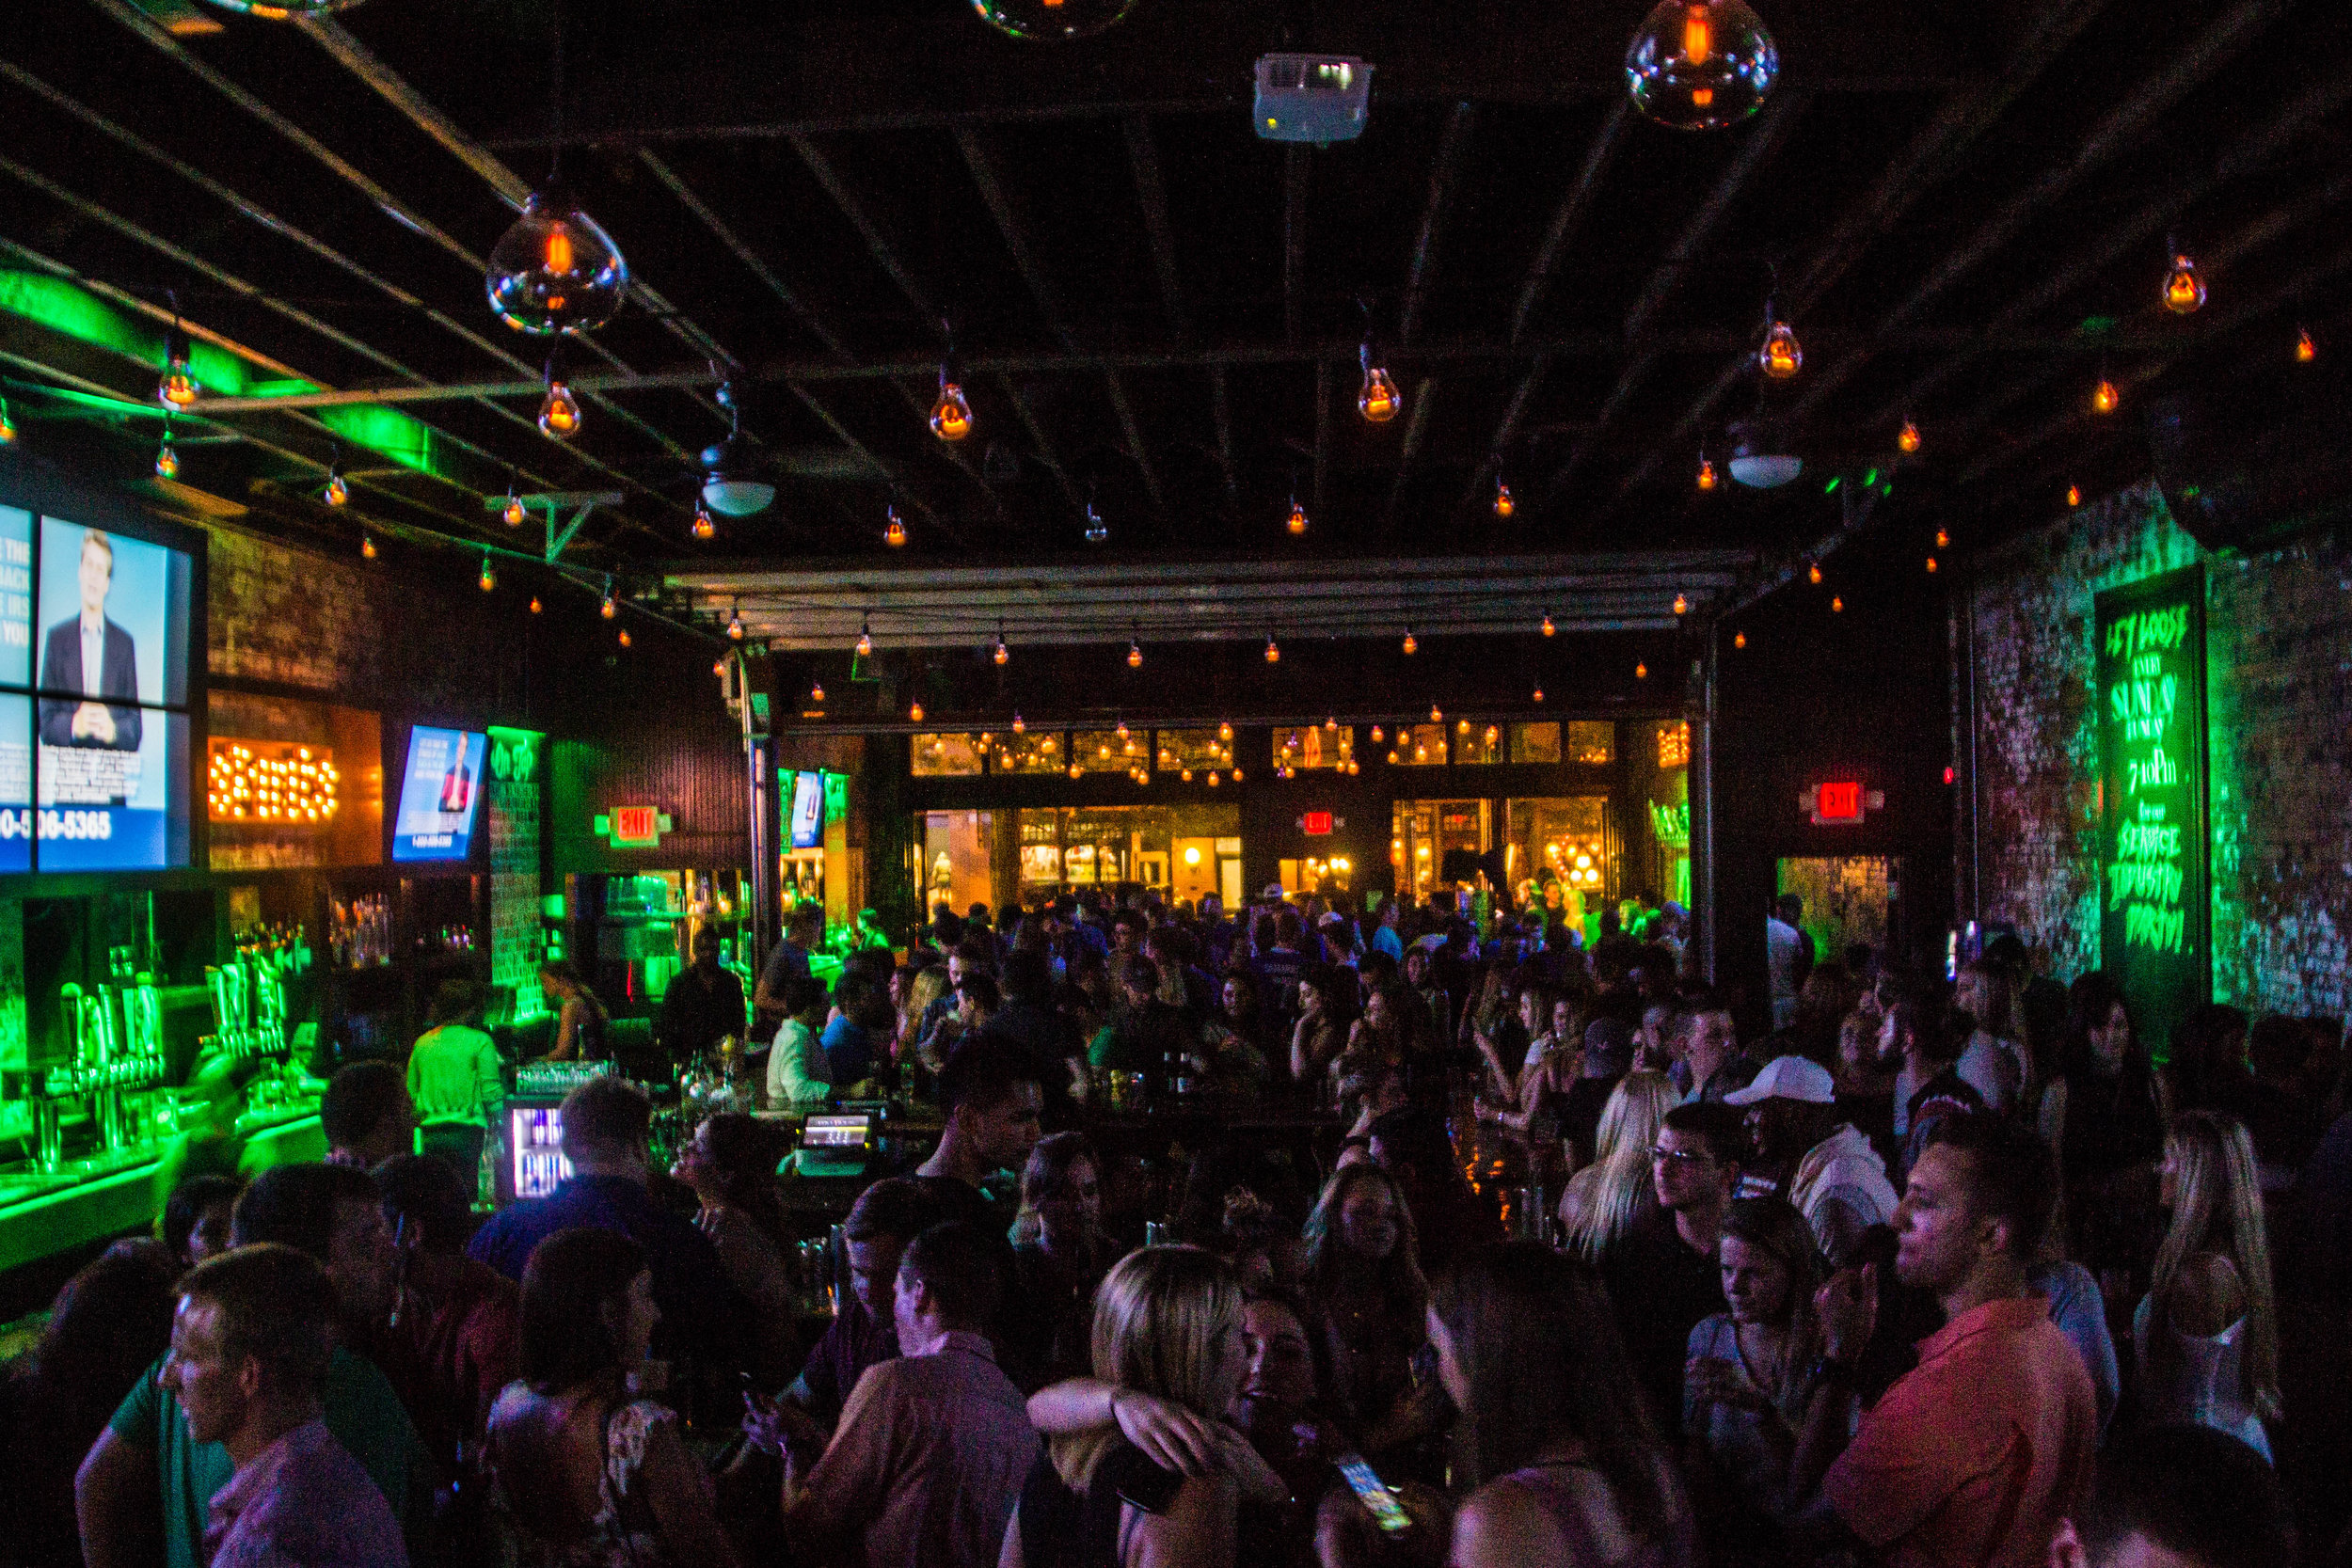 pint-house-columbus-ohio-bars-1.jpg